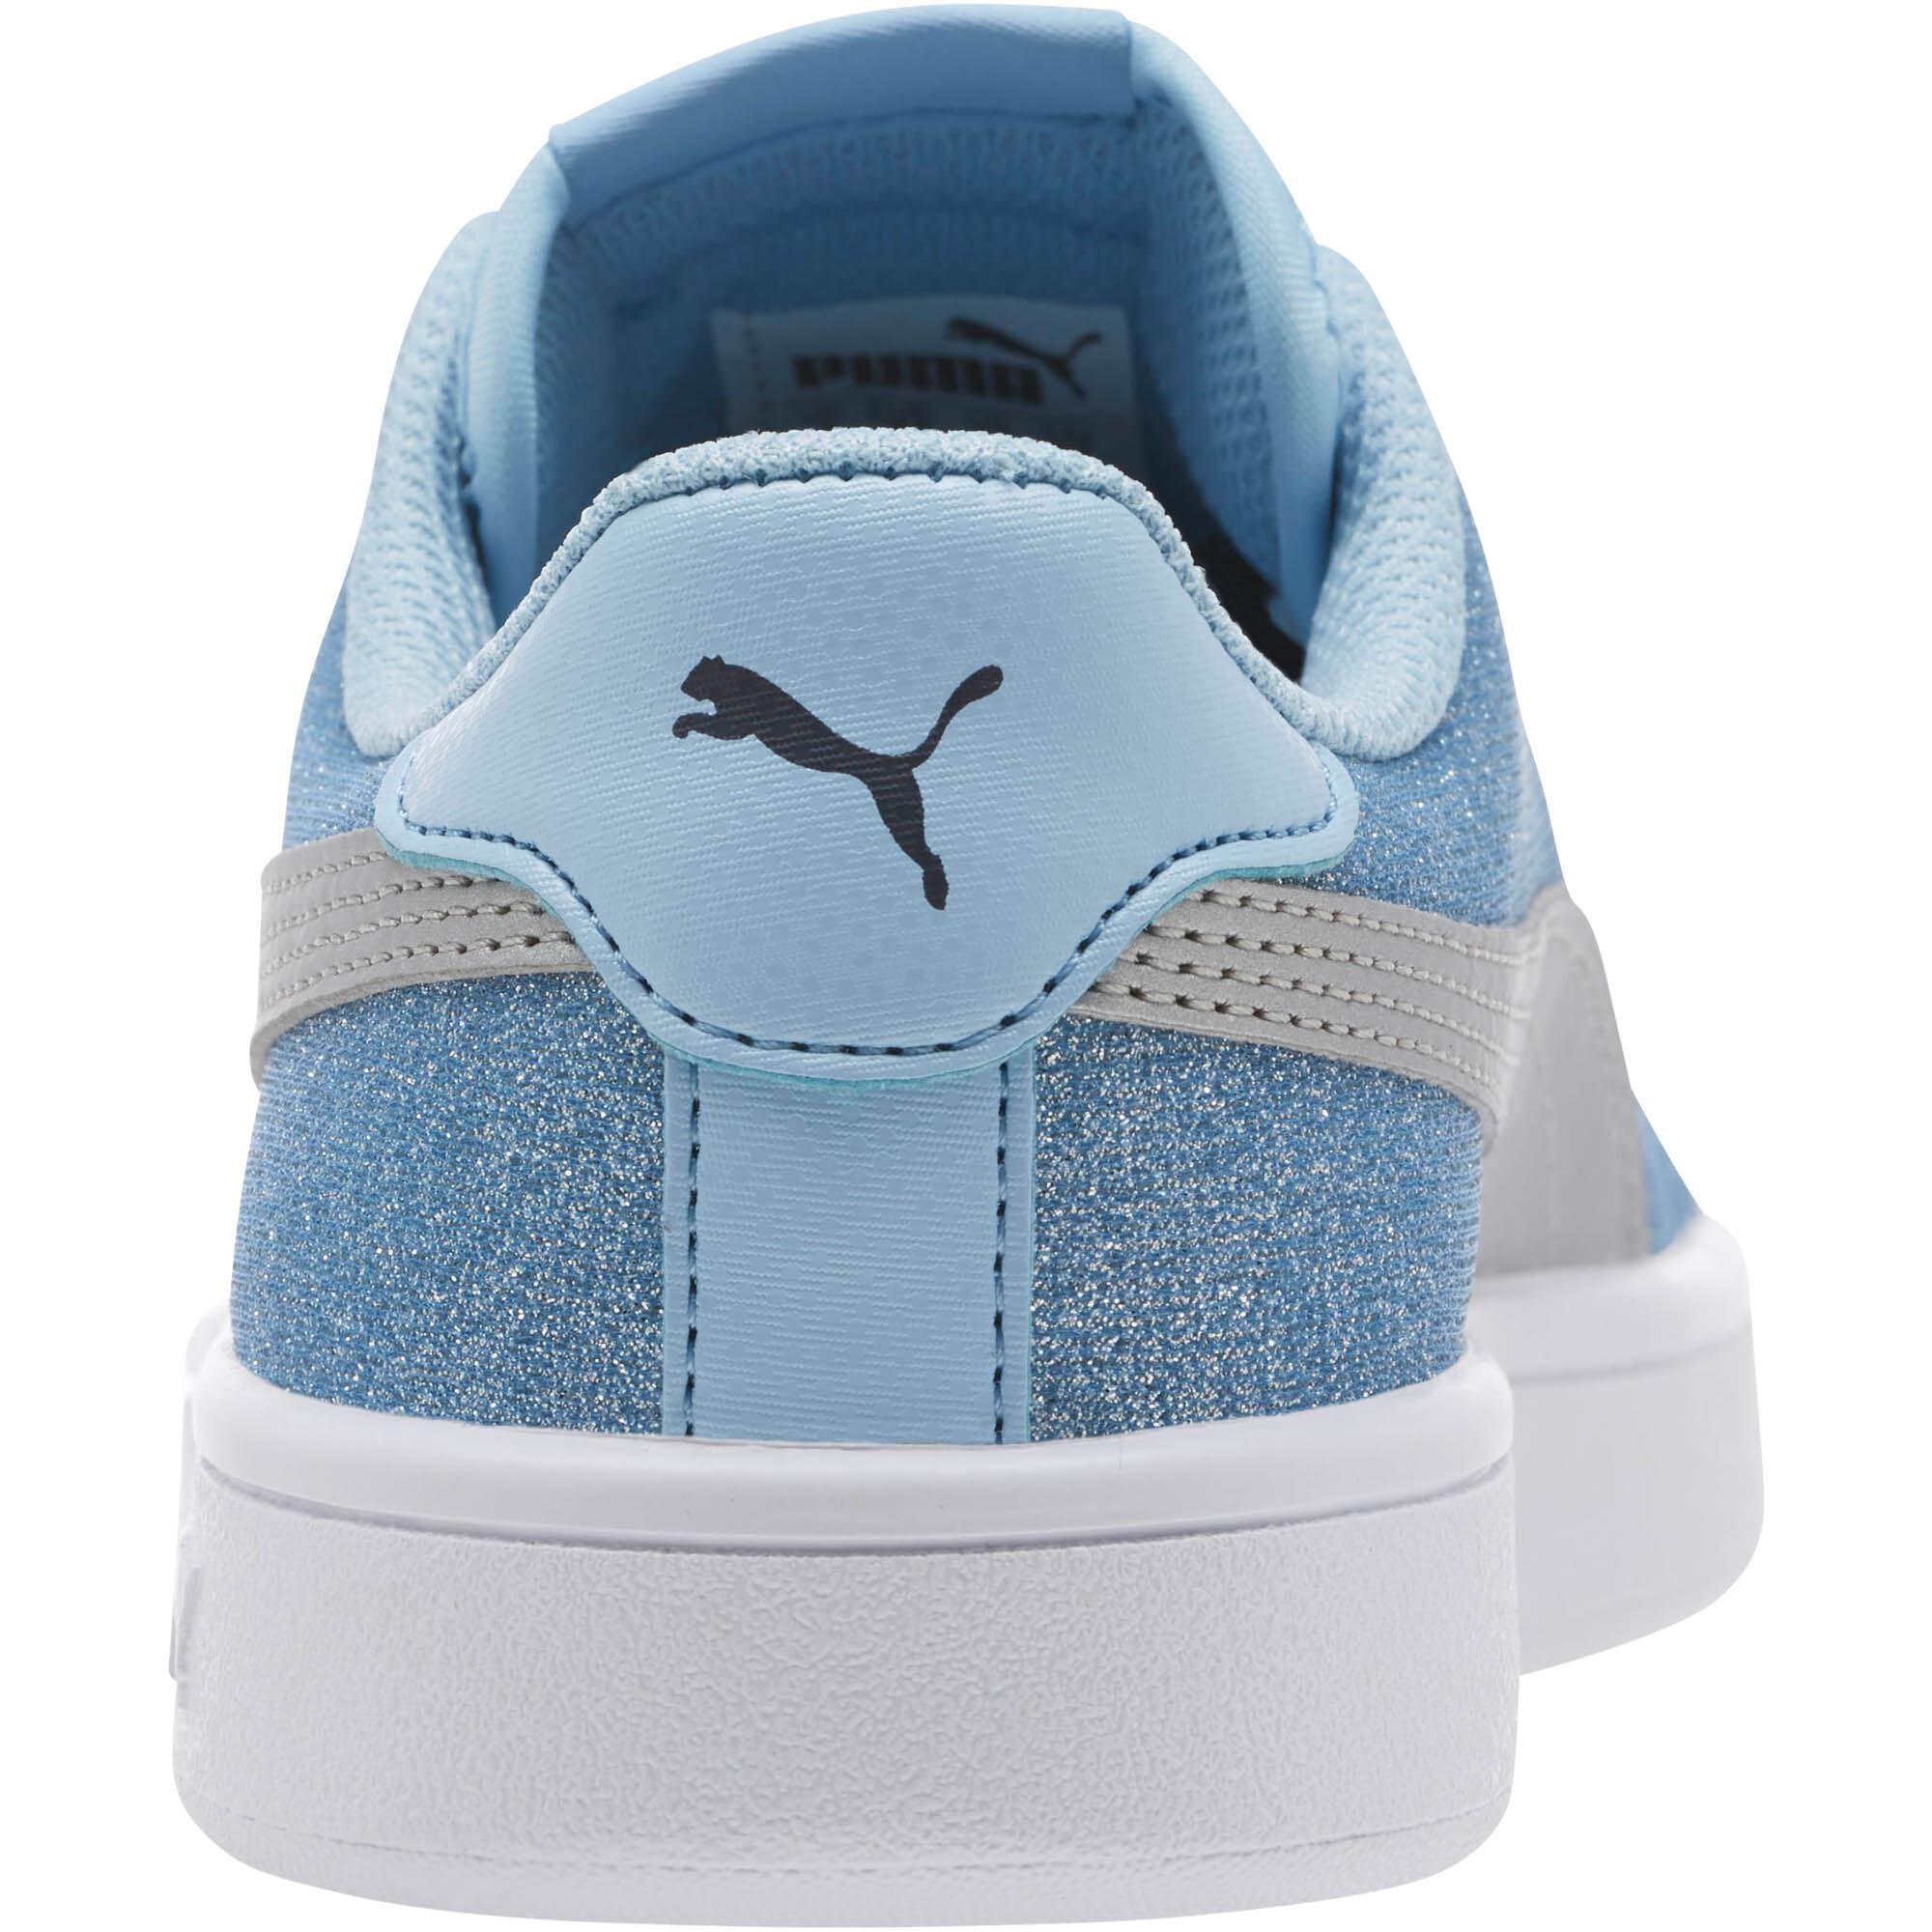 PUMA-Smash-v2-Glitz-Glam-Sneakers-JR-Girls-Shoe-Kids thumbnail 3